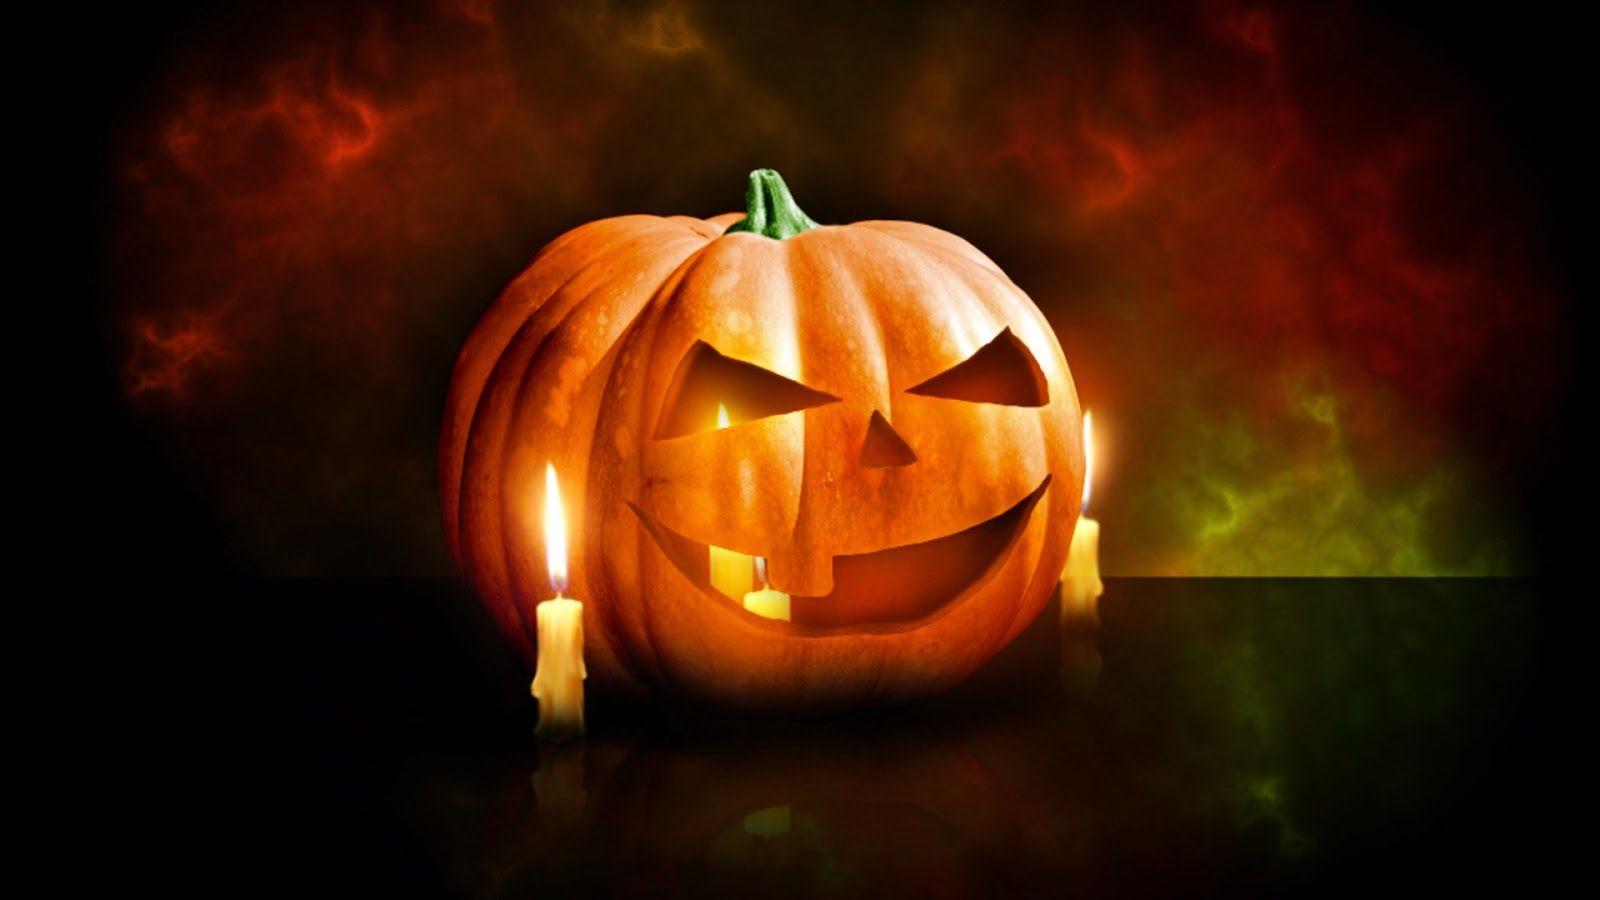 60 amazing halloween hd wallpapers 1920x1080 - 2560x1600 px [set 4